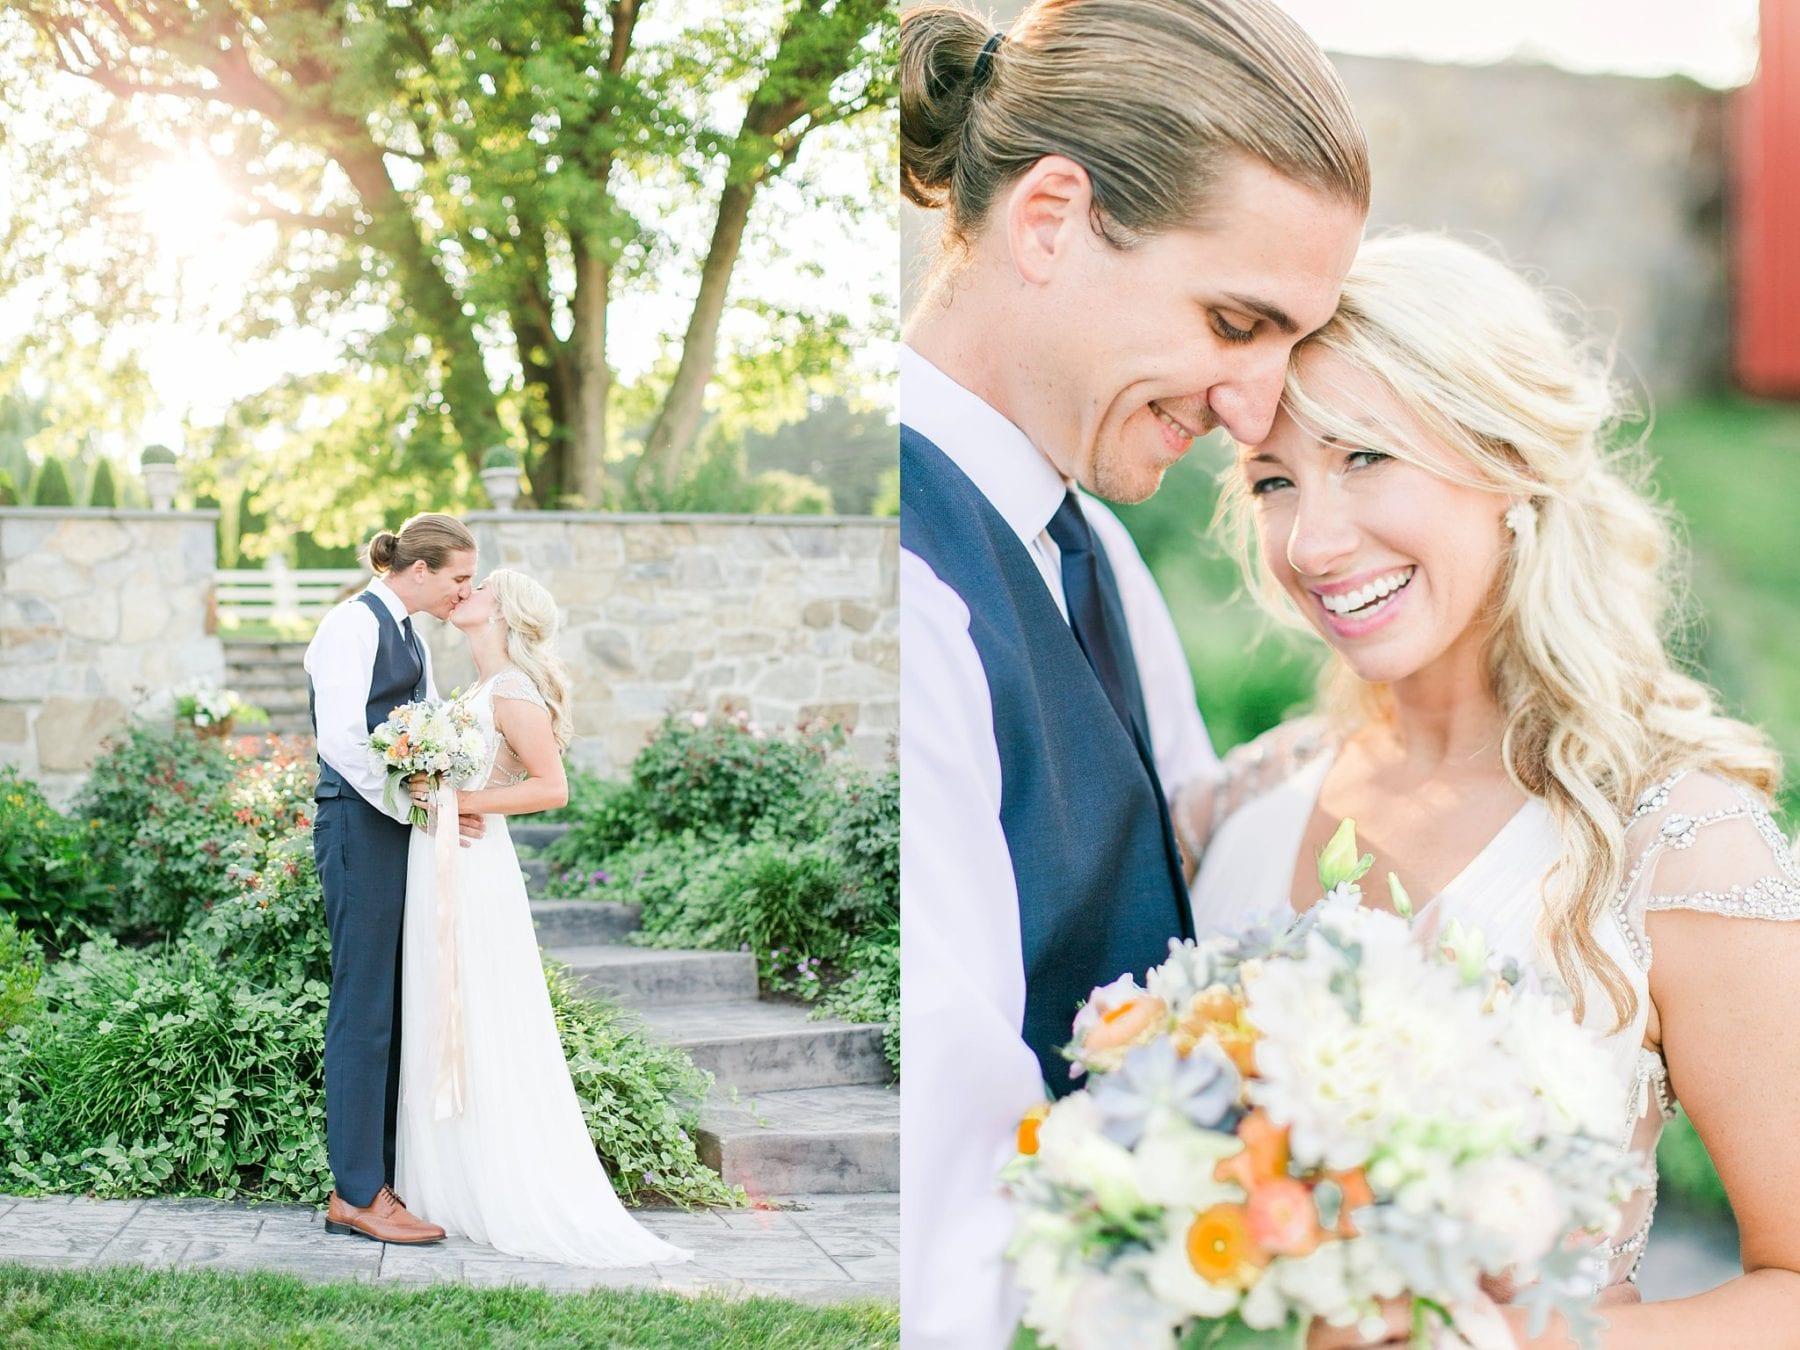 Pond View Farm Wedding Photos Maryland Wedding Photographer Kristen & Ryan Megan Kelsey Photography Blog-231.jpg